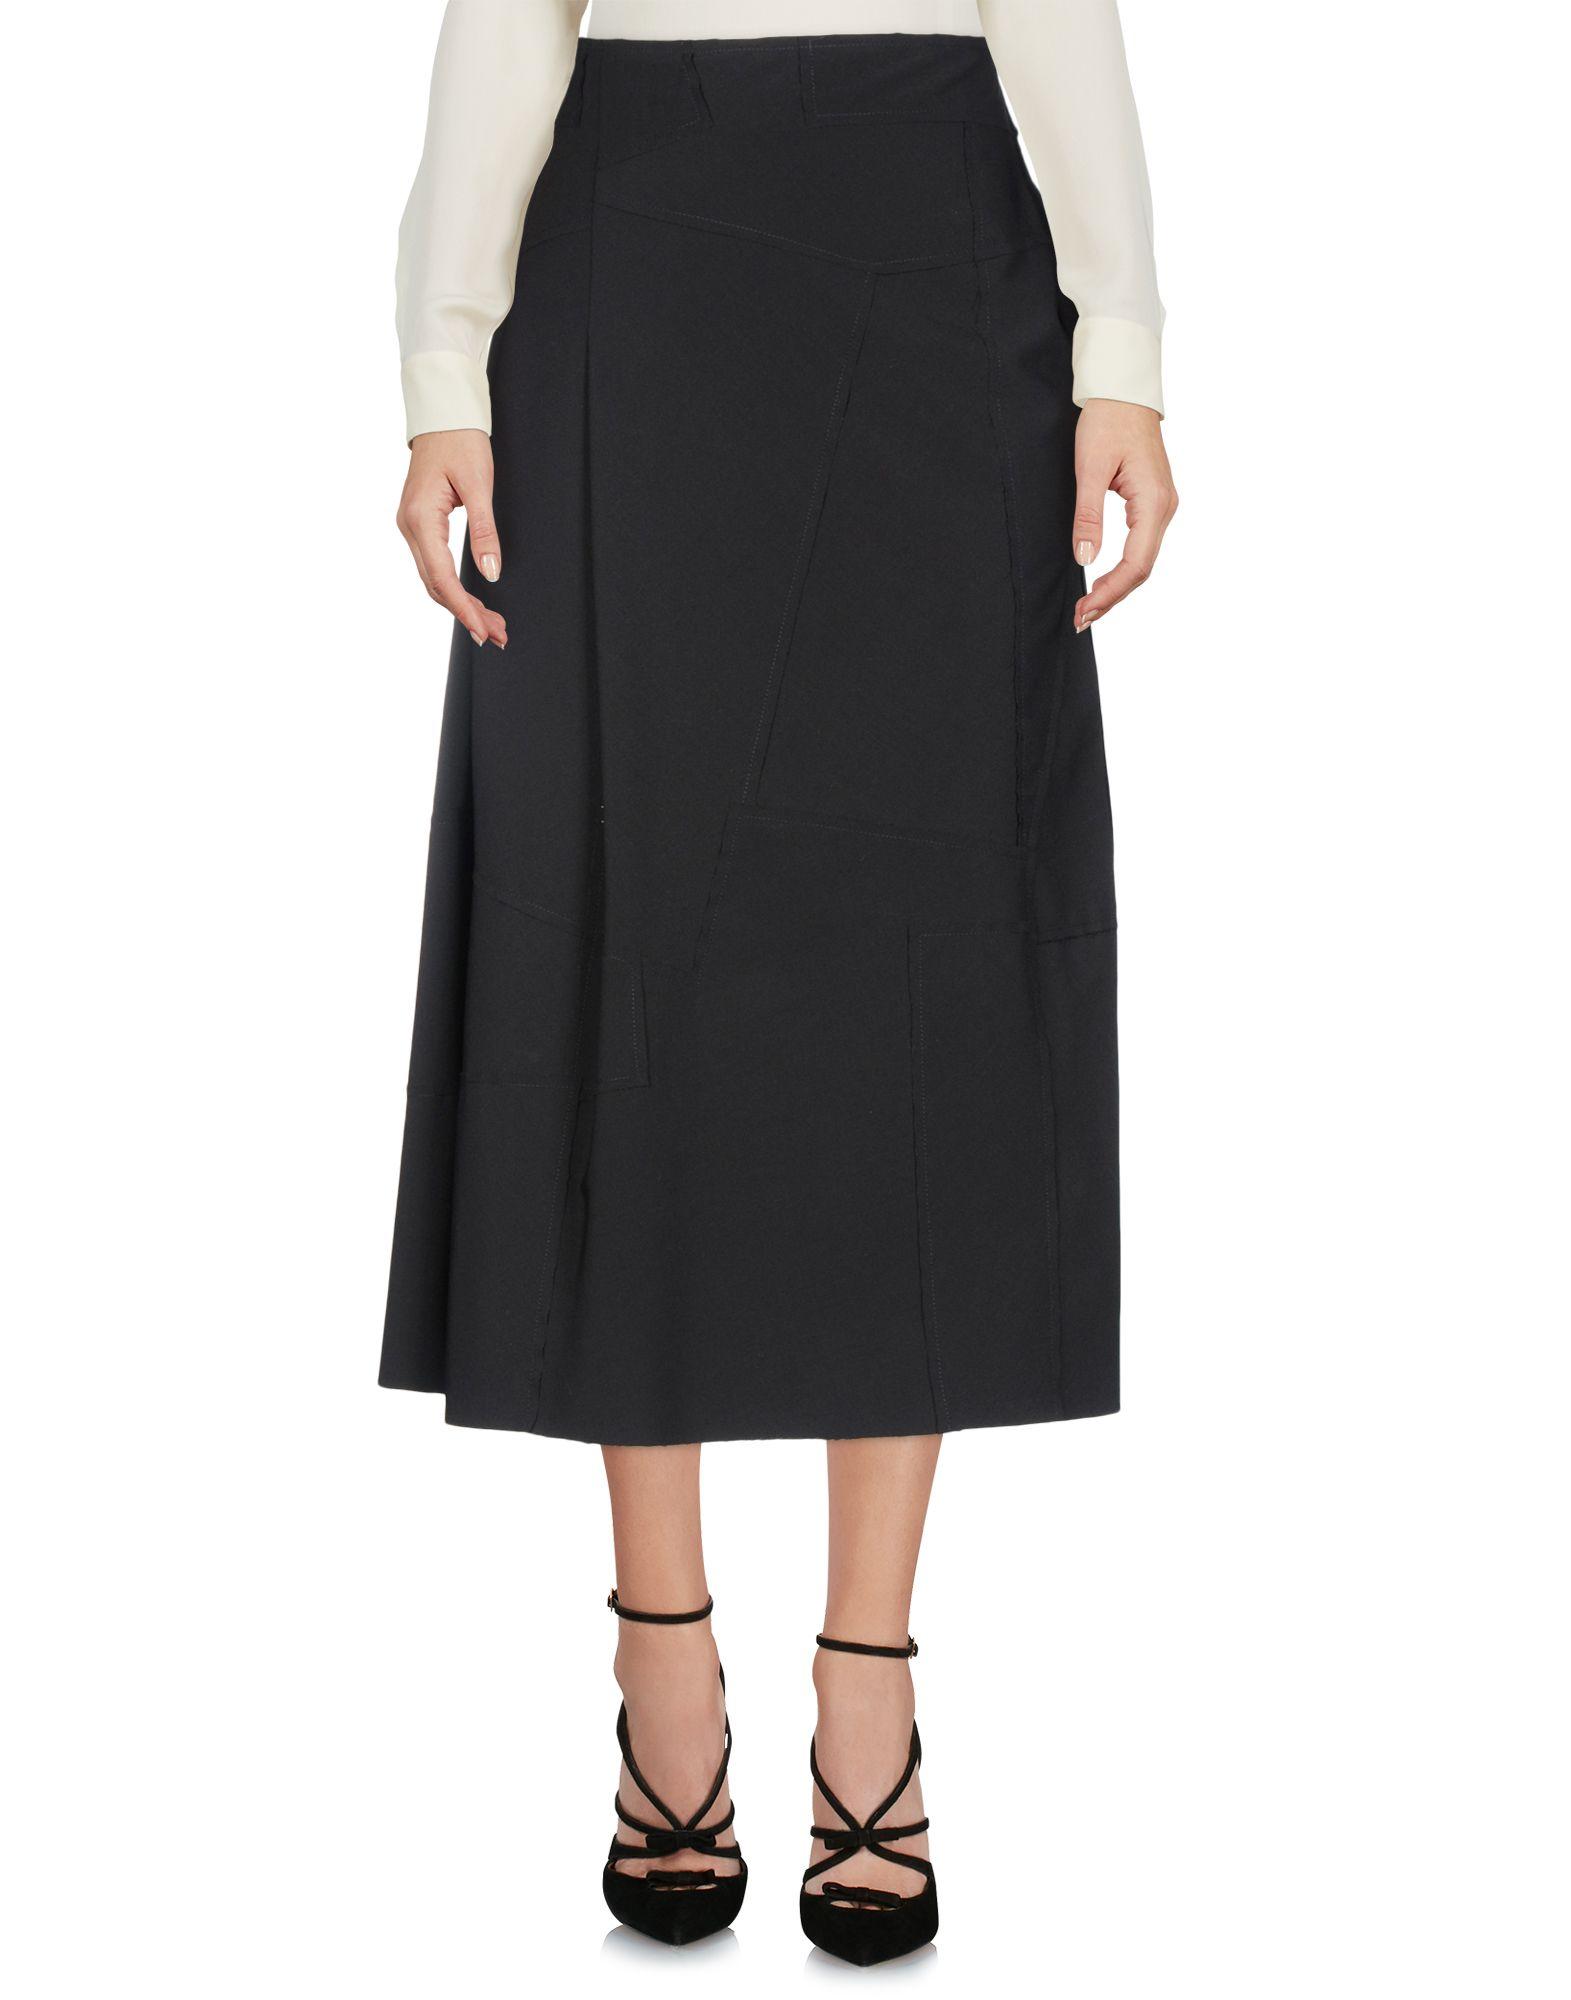 MAISON FLÂNEUR Юбка длиной 3/4 moschino couture юбка длиной 3 4